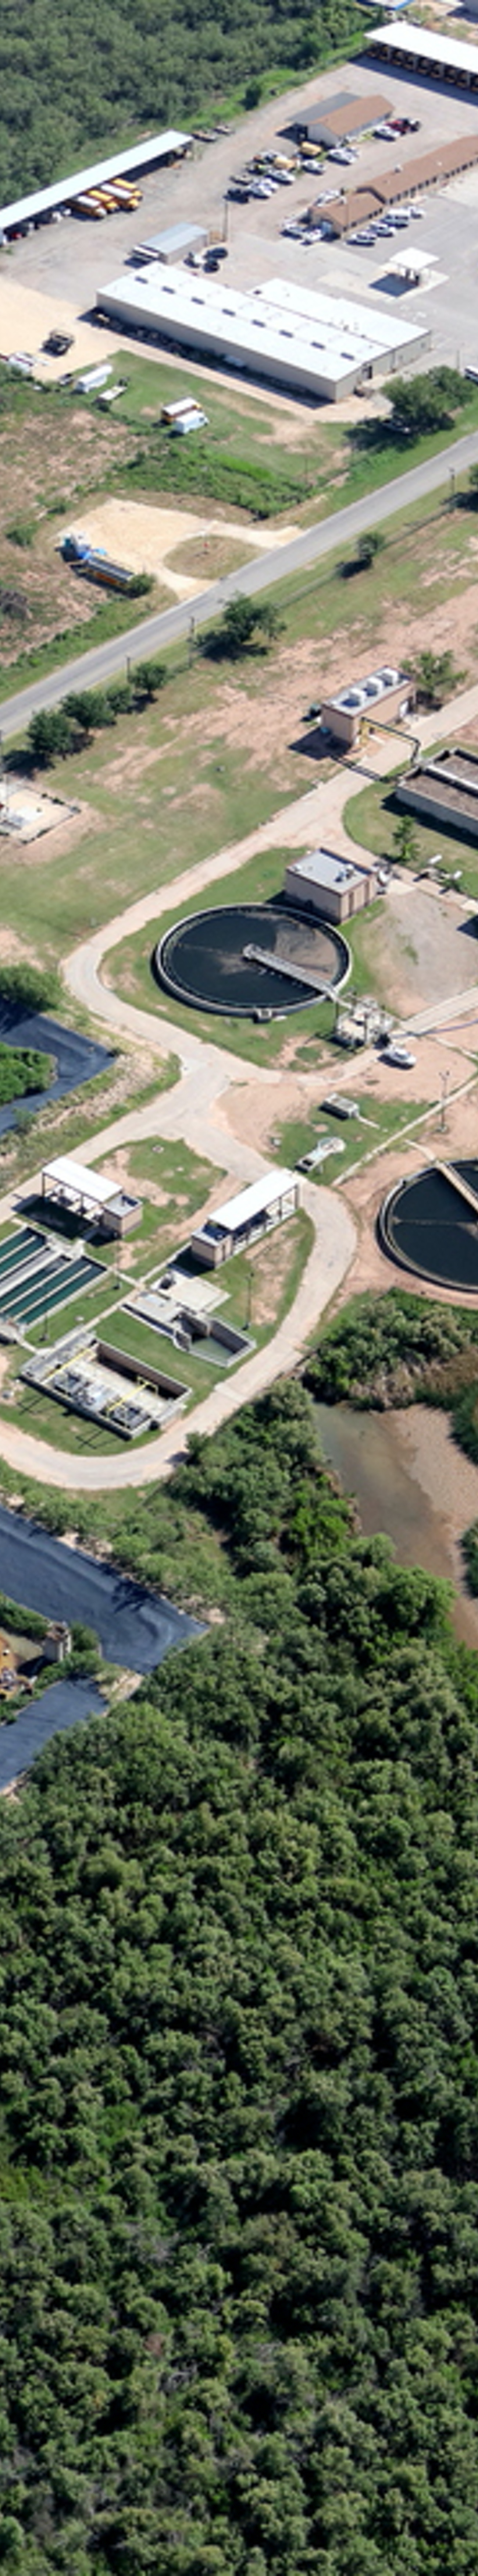 Big Spring Wastewater Treatment Plant Headworks Improvements